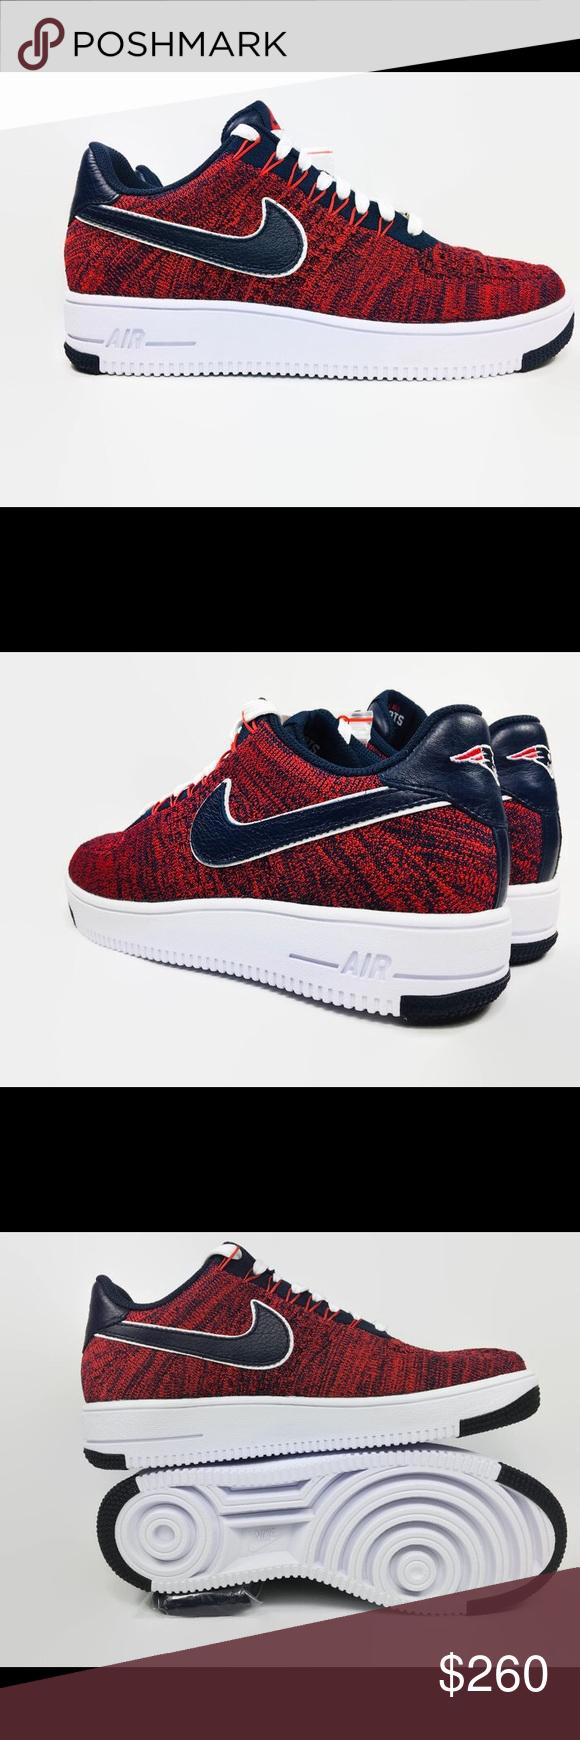 separation shoes d45ce 75173 Nike Shoes | Nike Af1 Flyknit Robert Kraft Patriots Size 8 ...